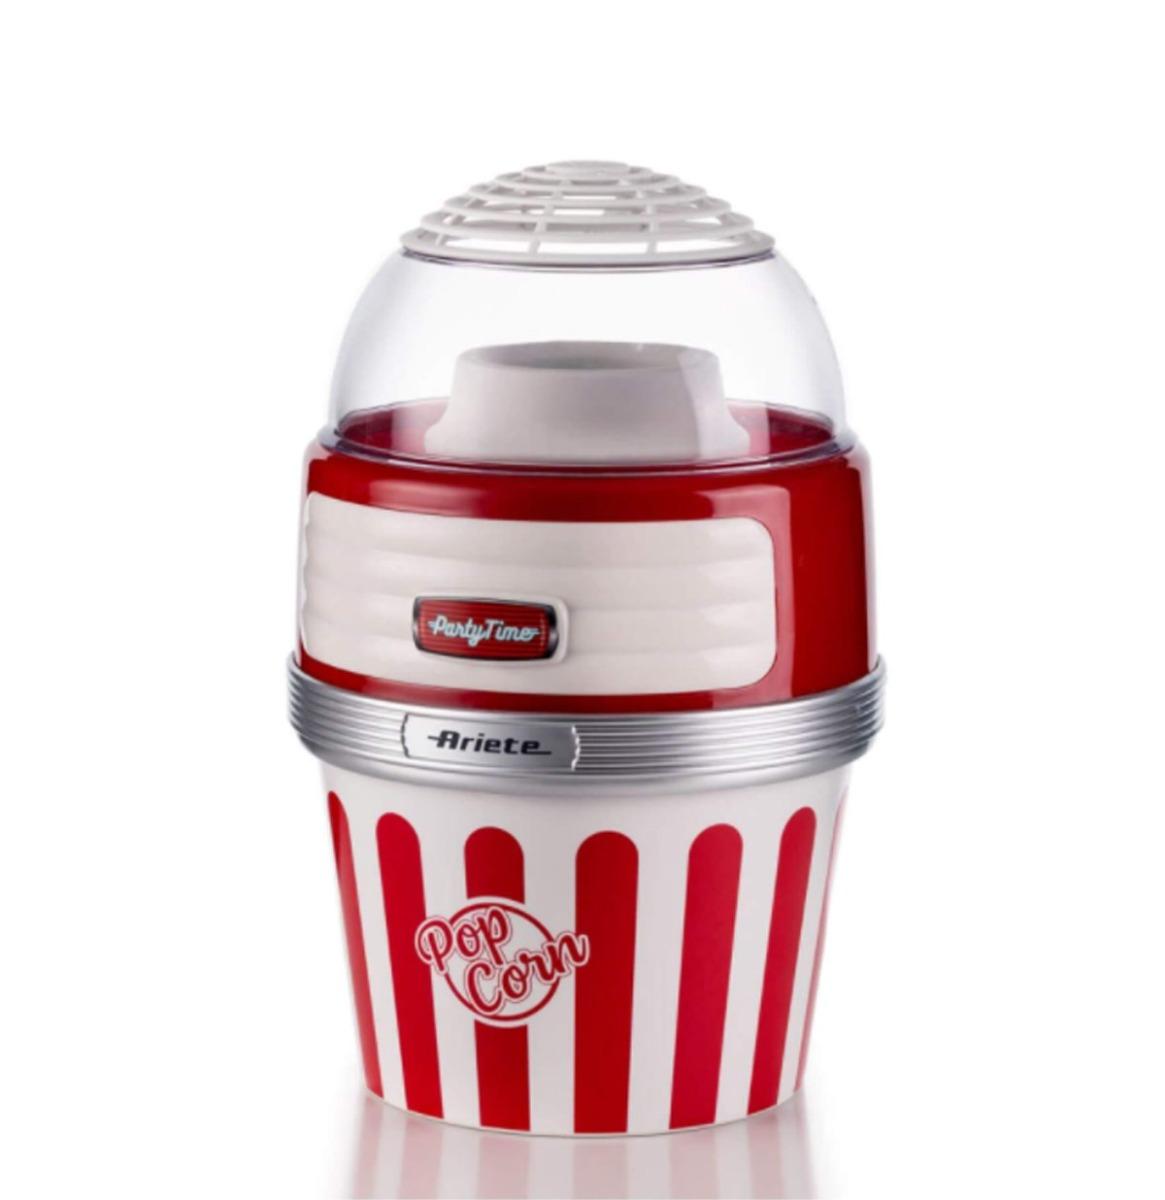 Ariete Partytime Retro Popcorn Popper - Rood